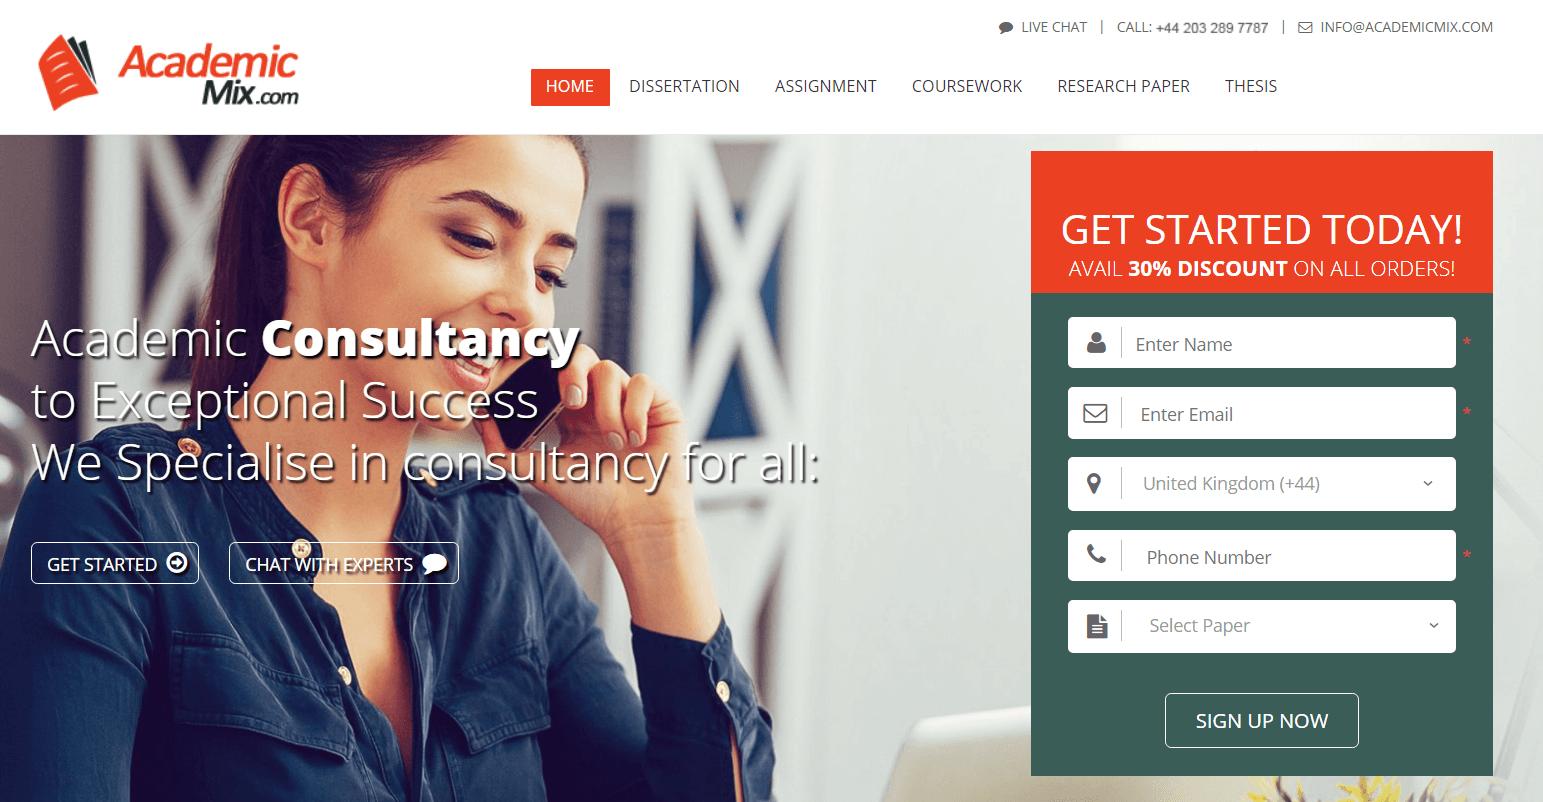 academicmix.com